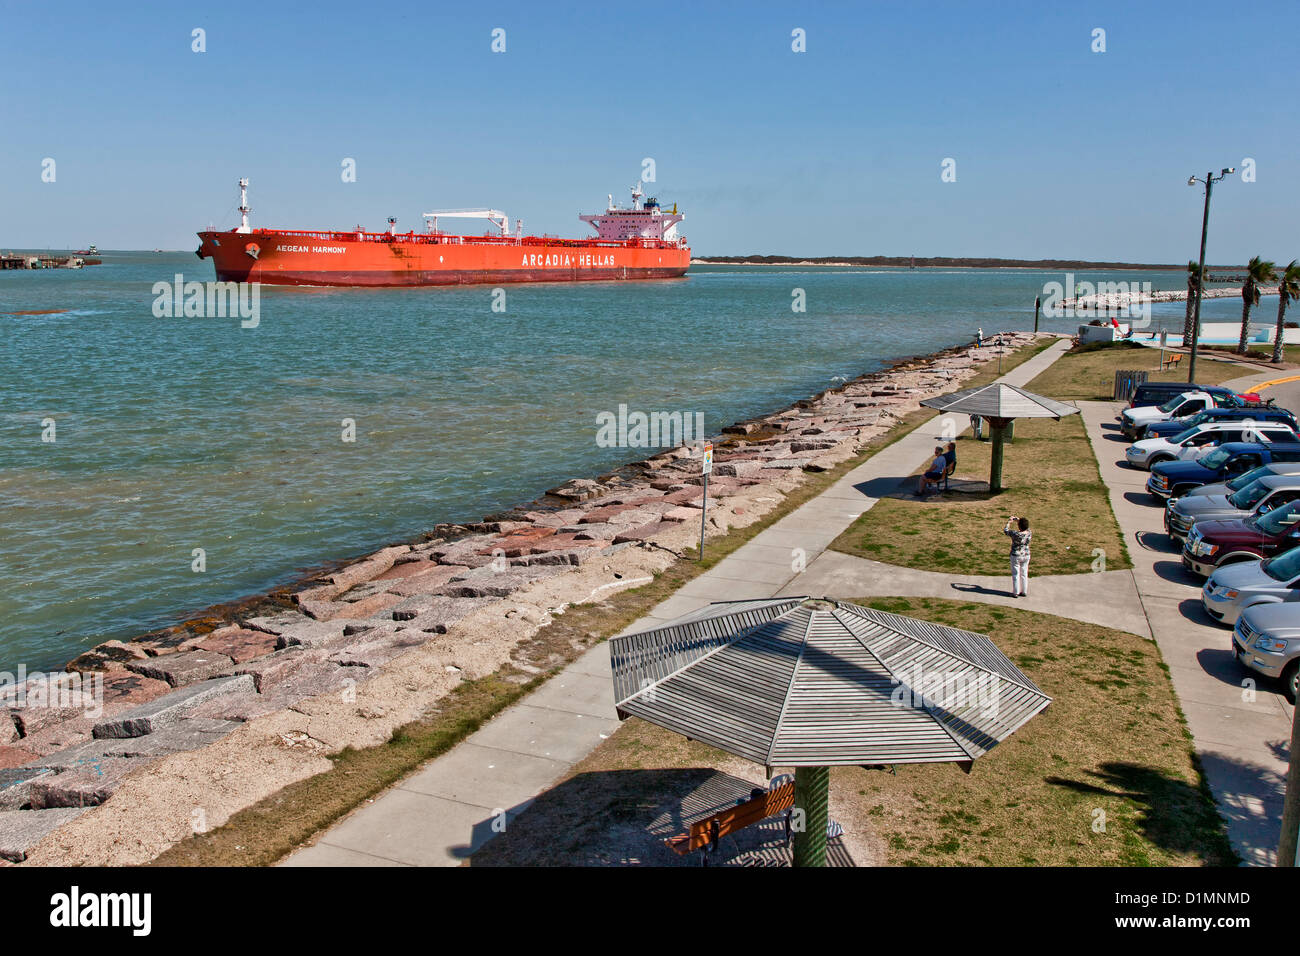 Tanker transportant du pétrole, Corpus Christi ship canal. Photo Stock